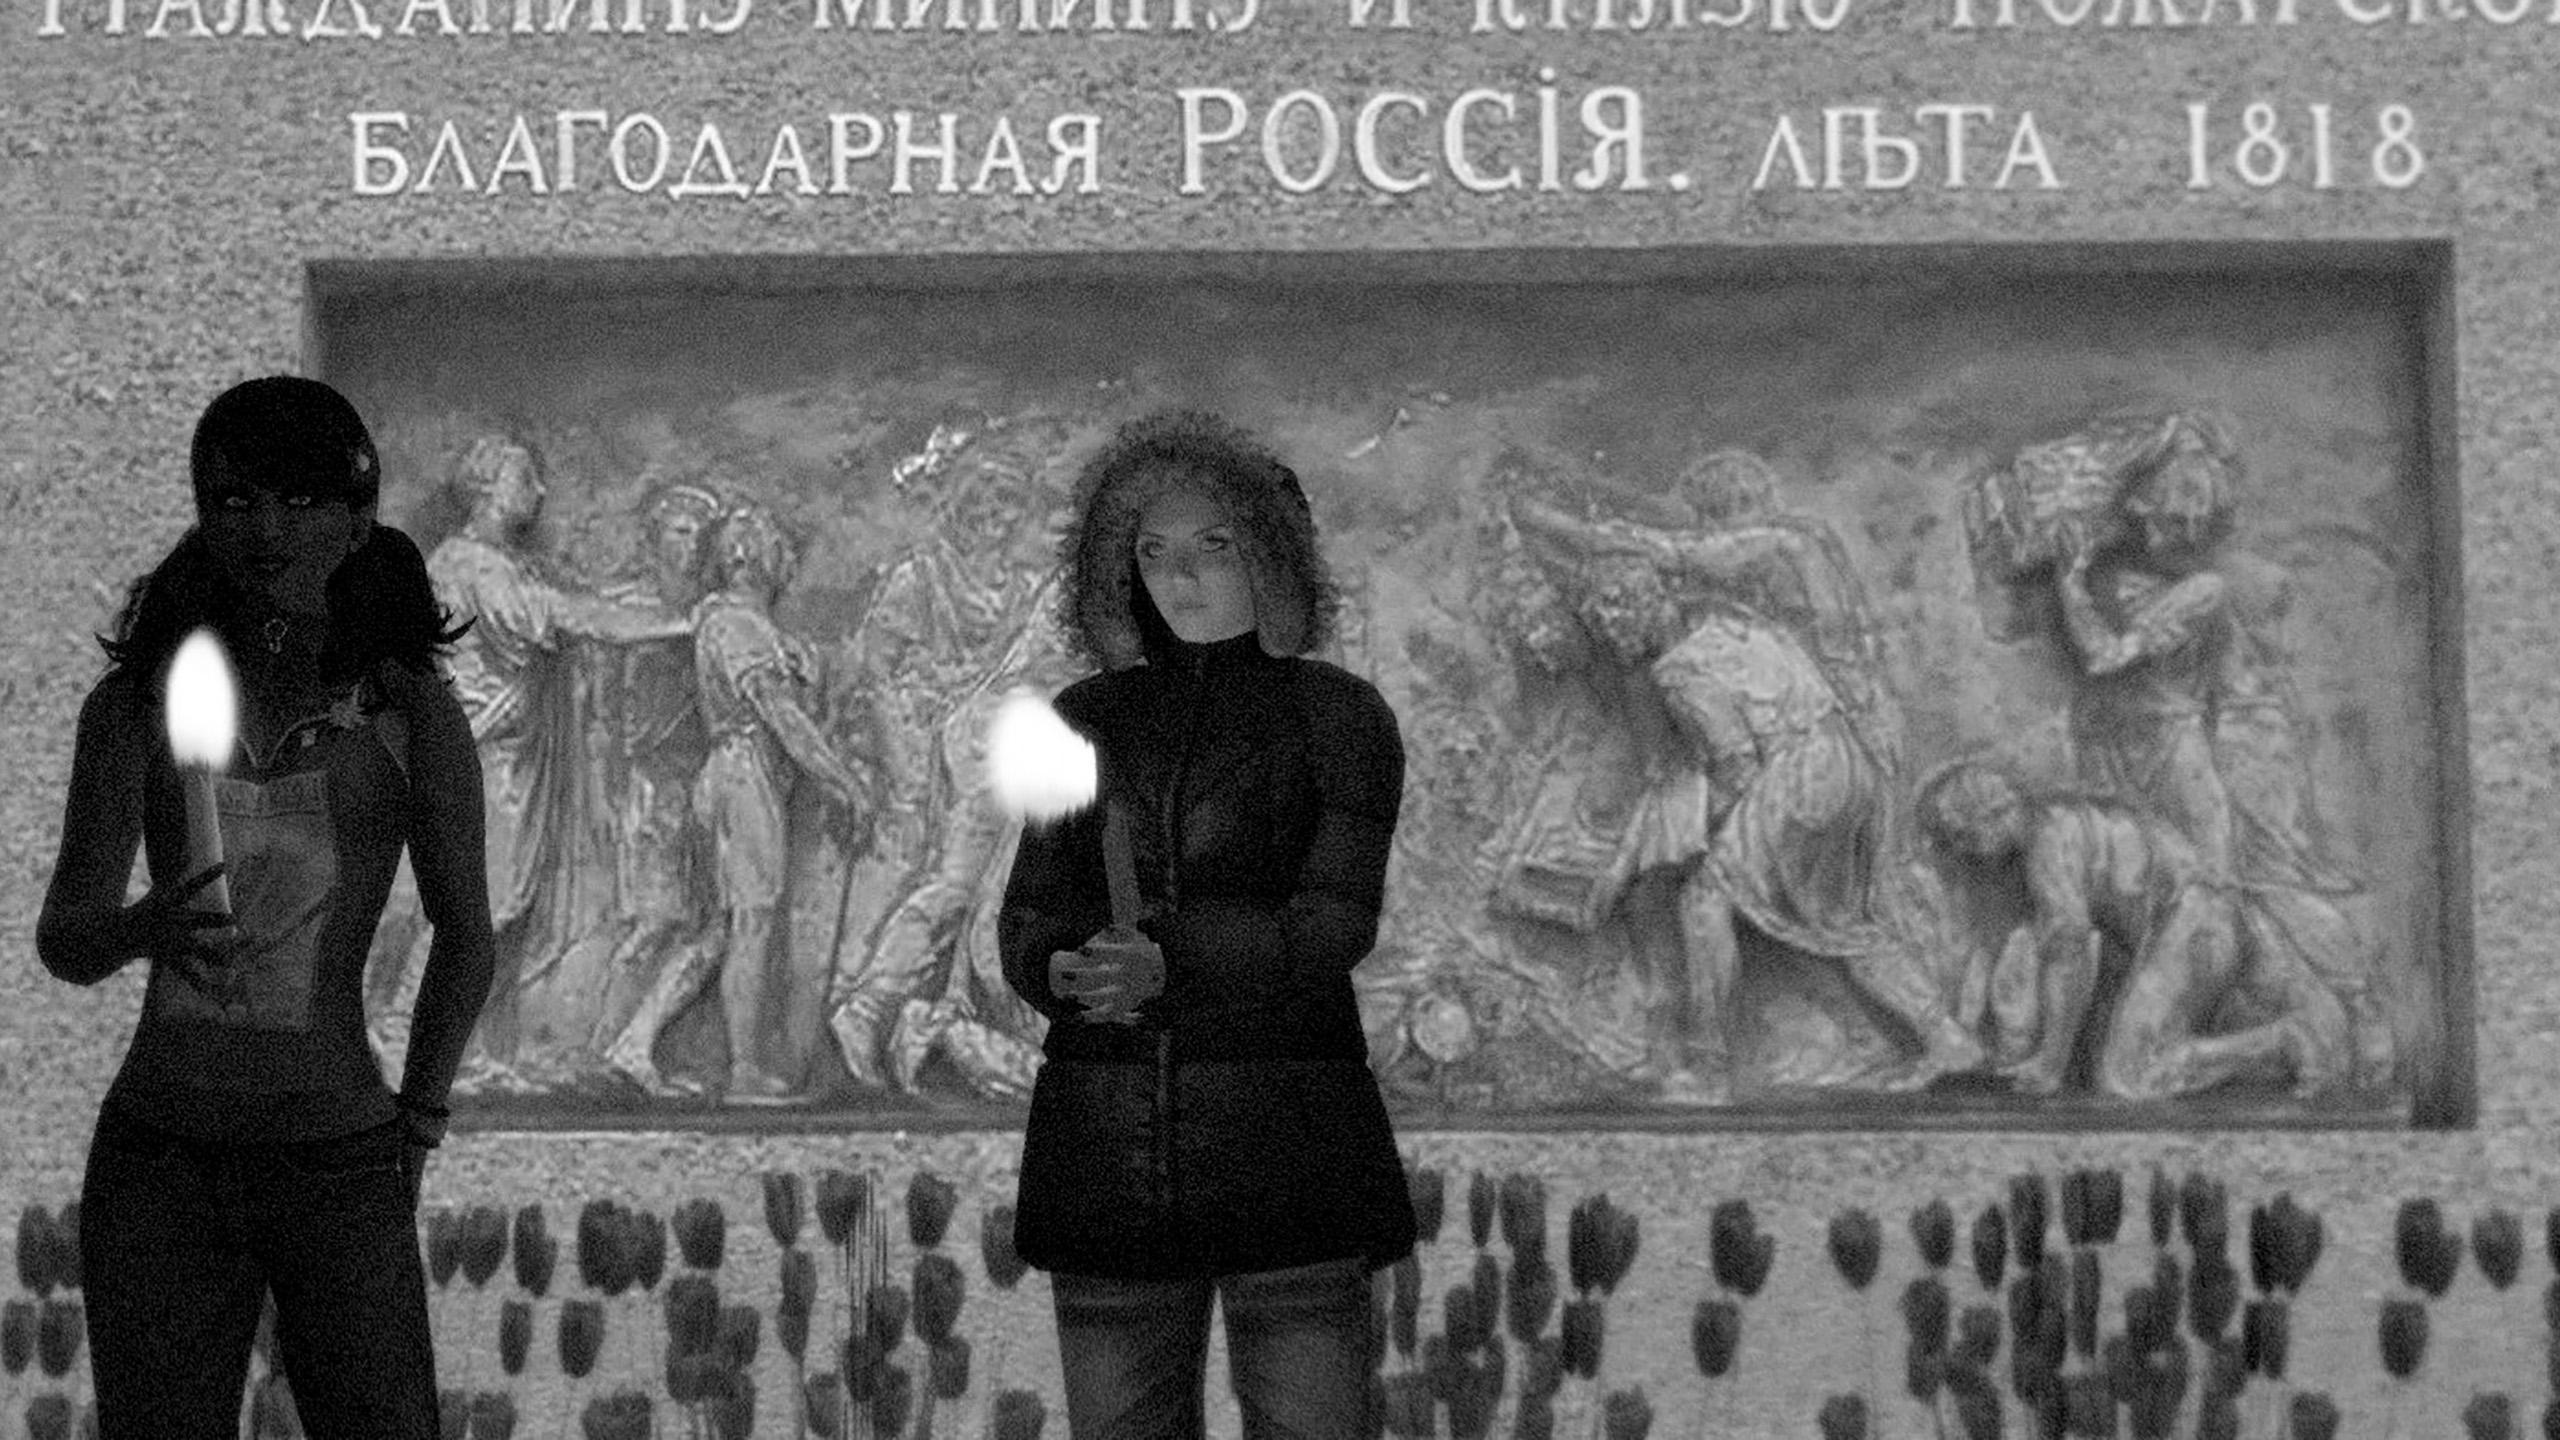 Activity No.14 – Nadya Tolokonnikova Candlelight Vigil